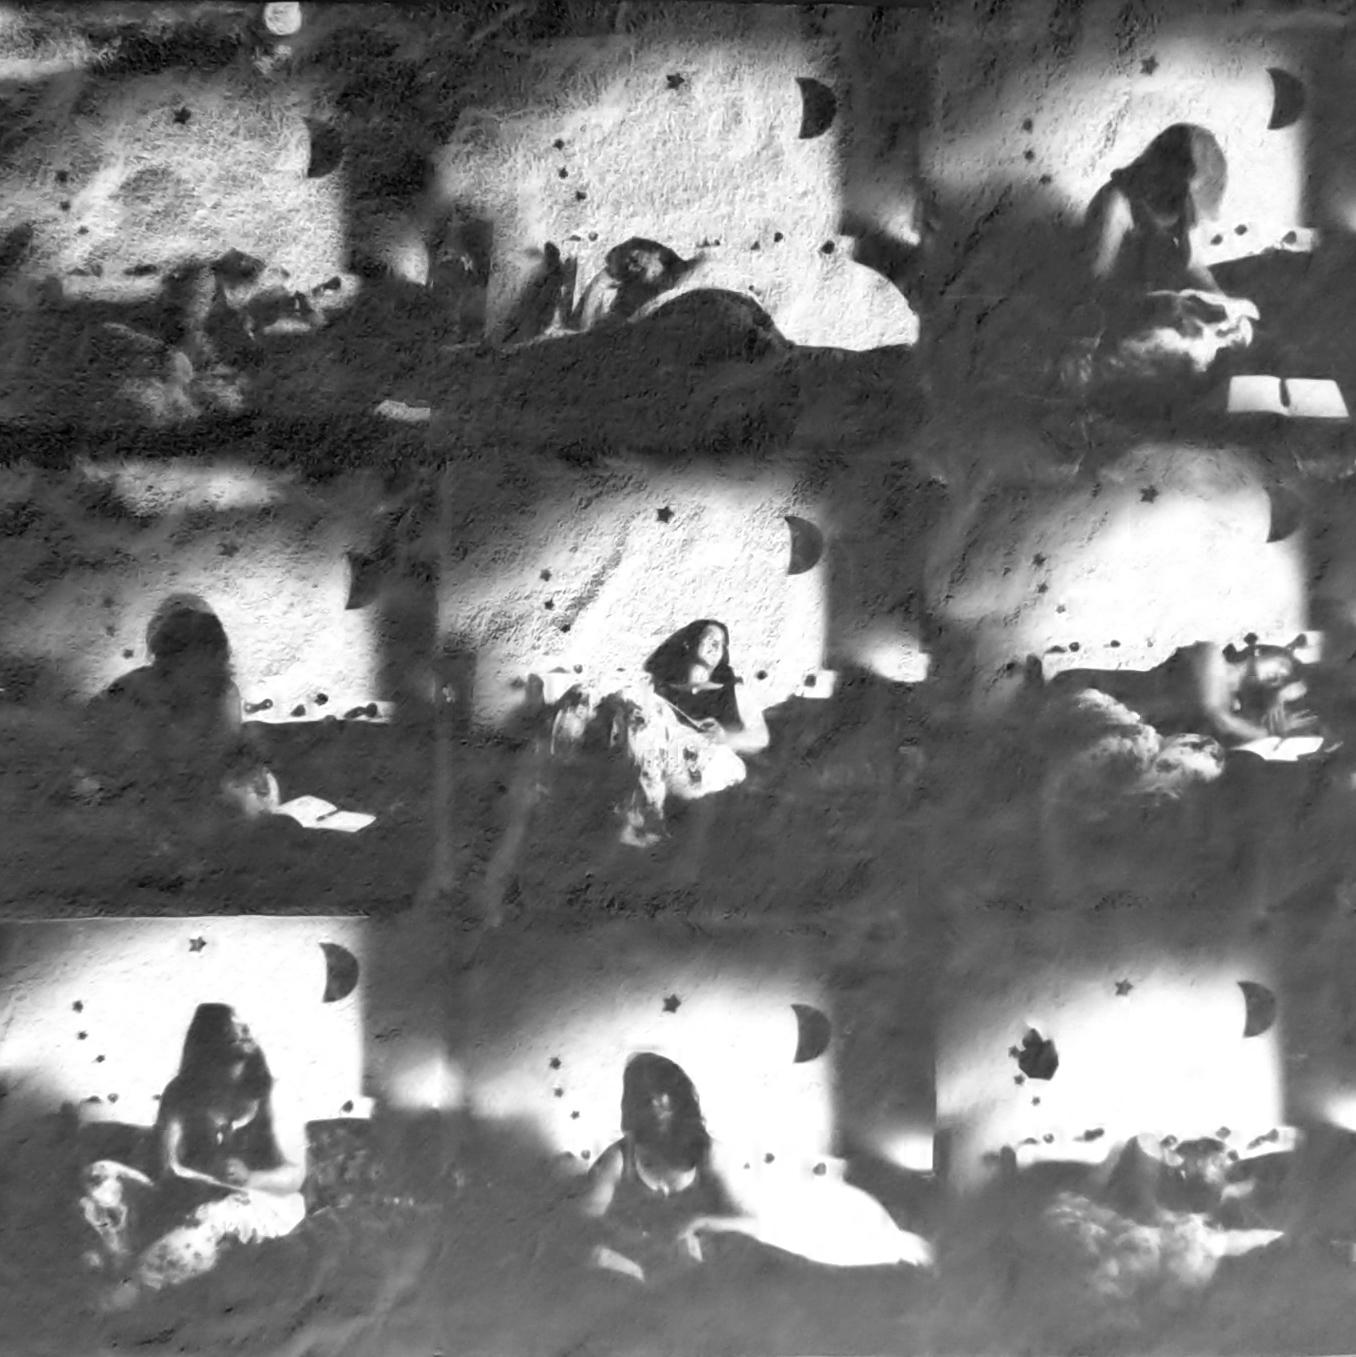 Lucy Wainwright - Fugitive sleep